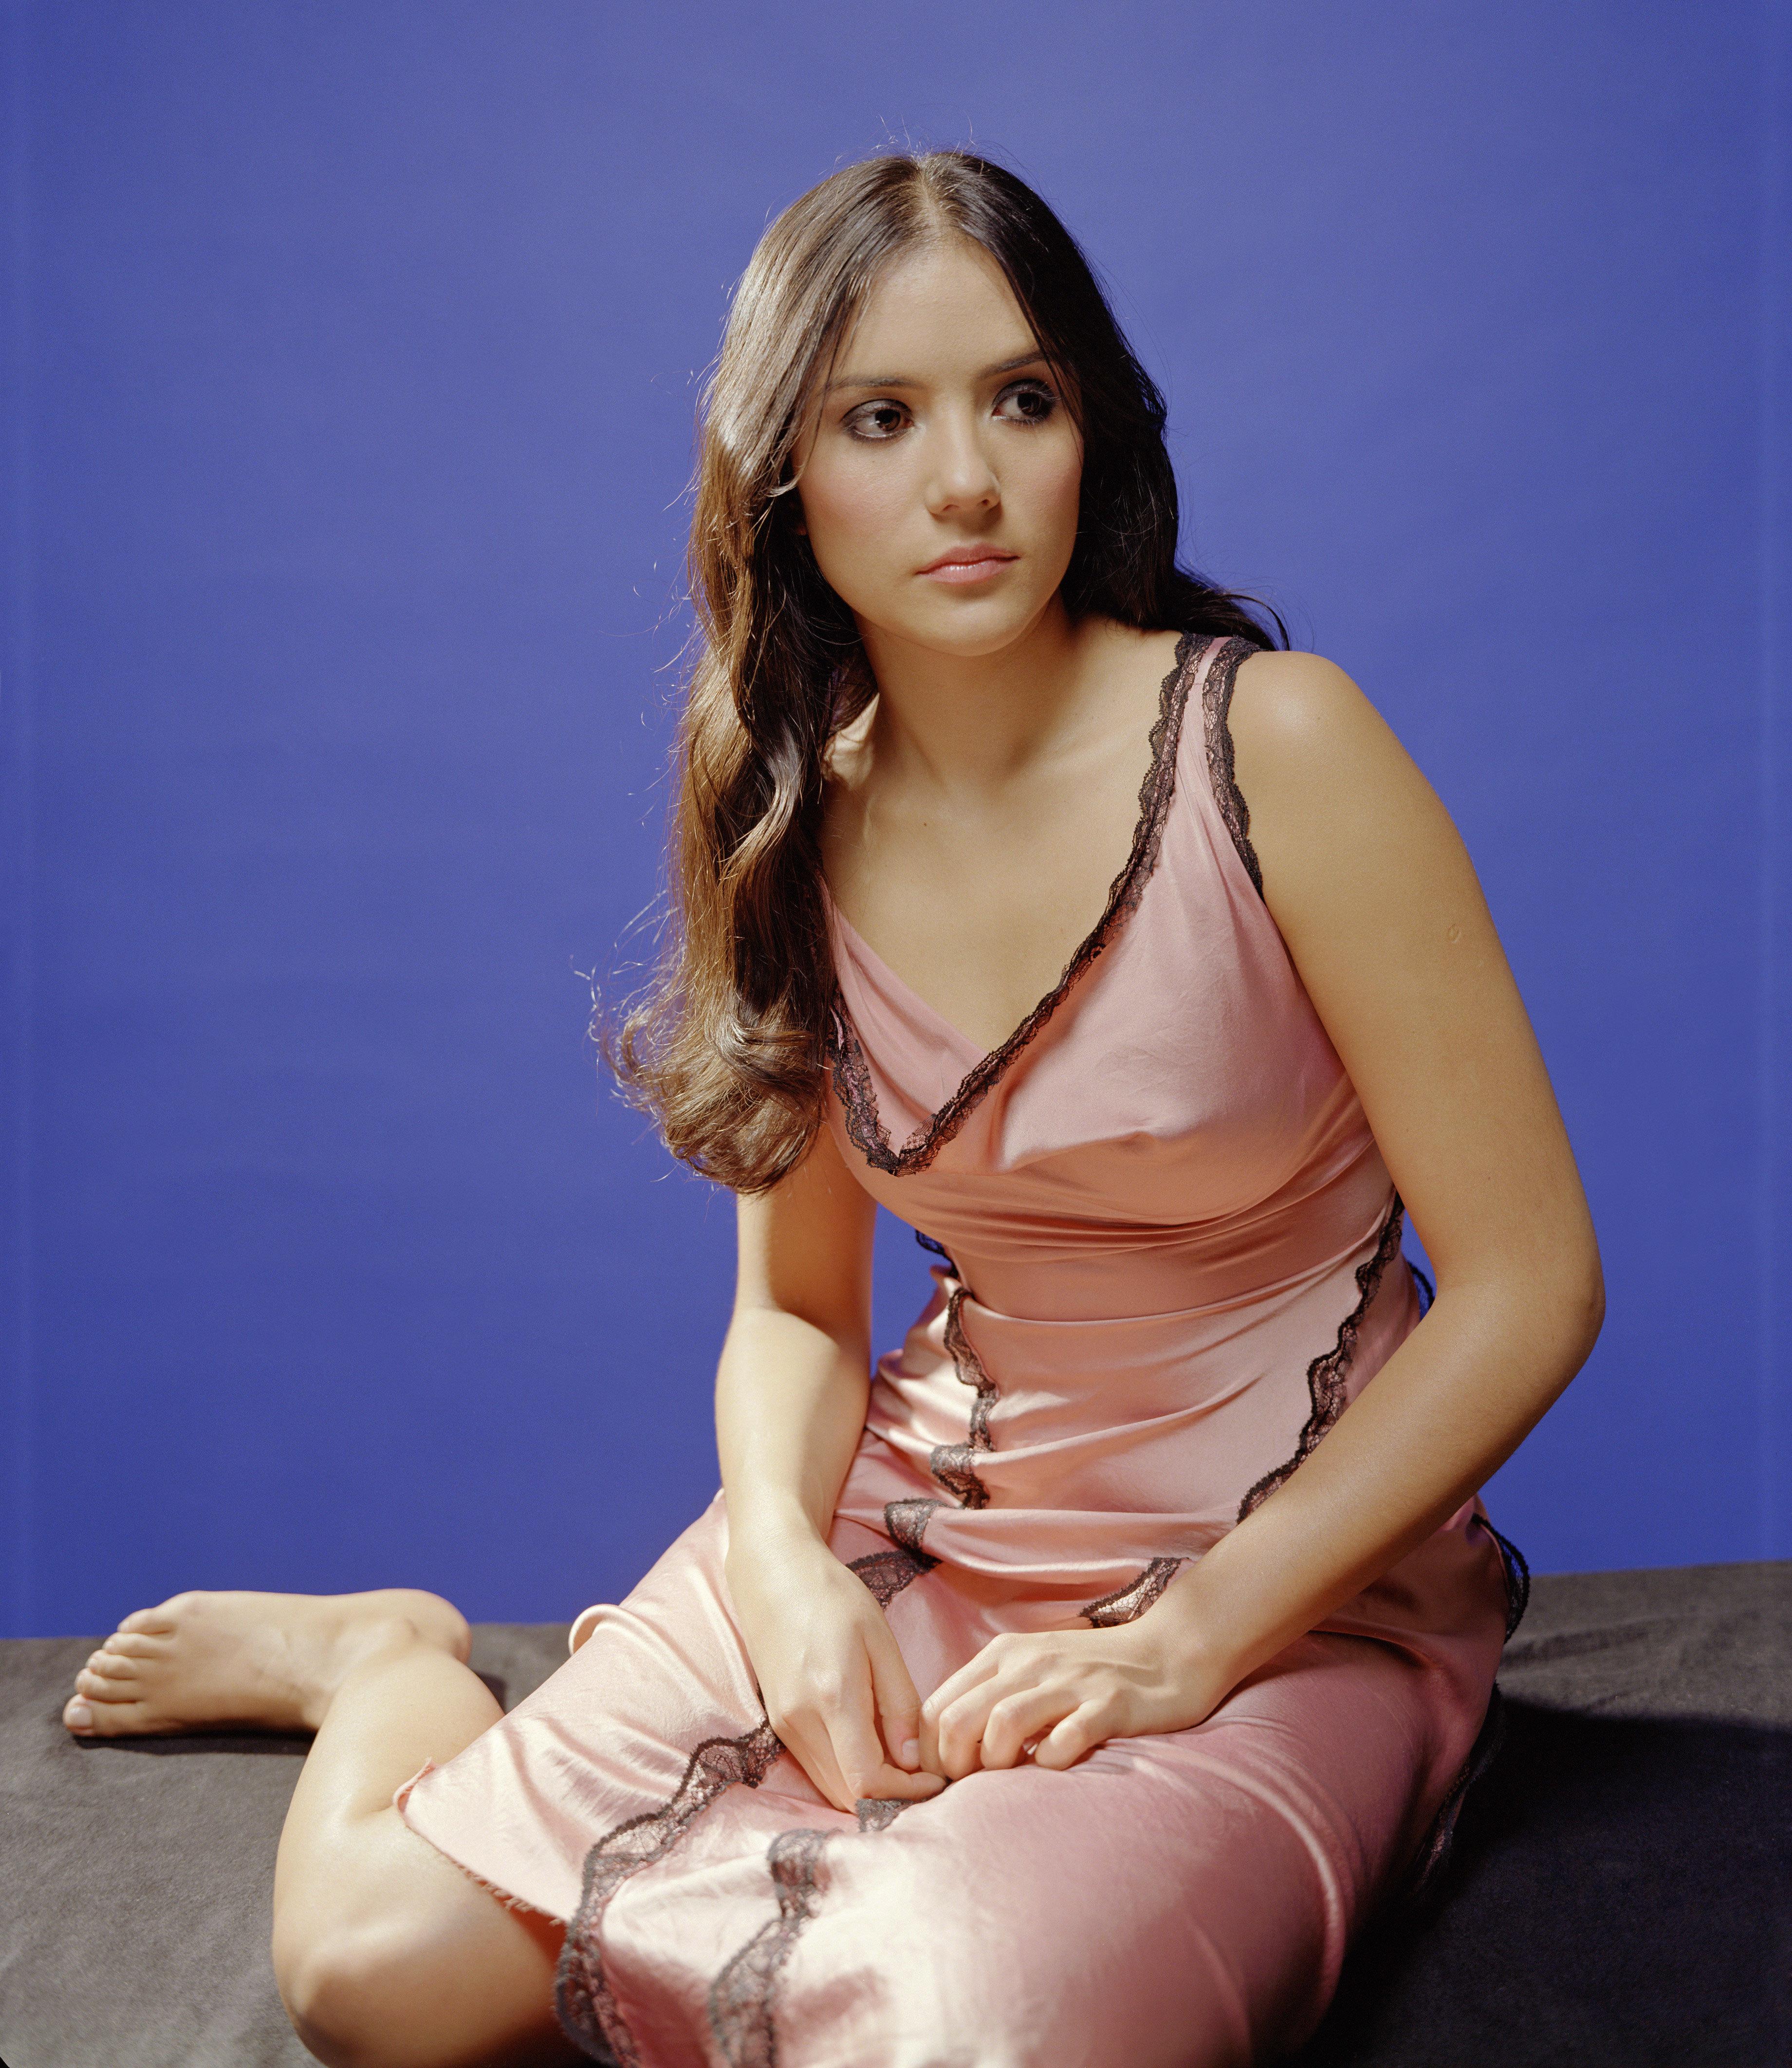 Alise Moreno nude 37